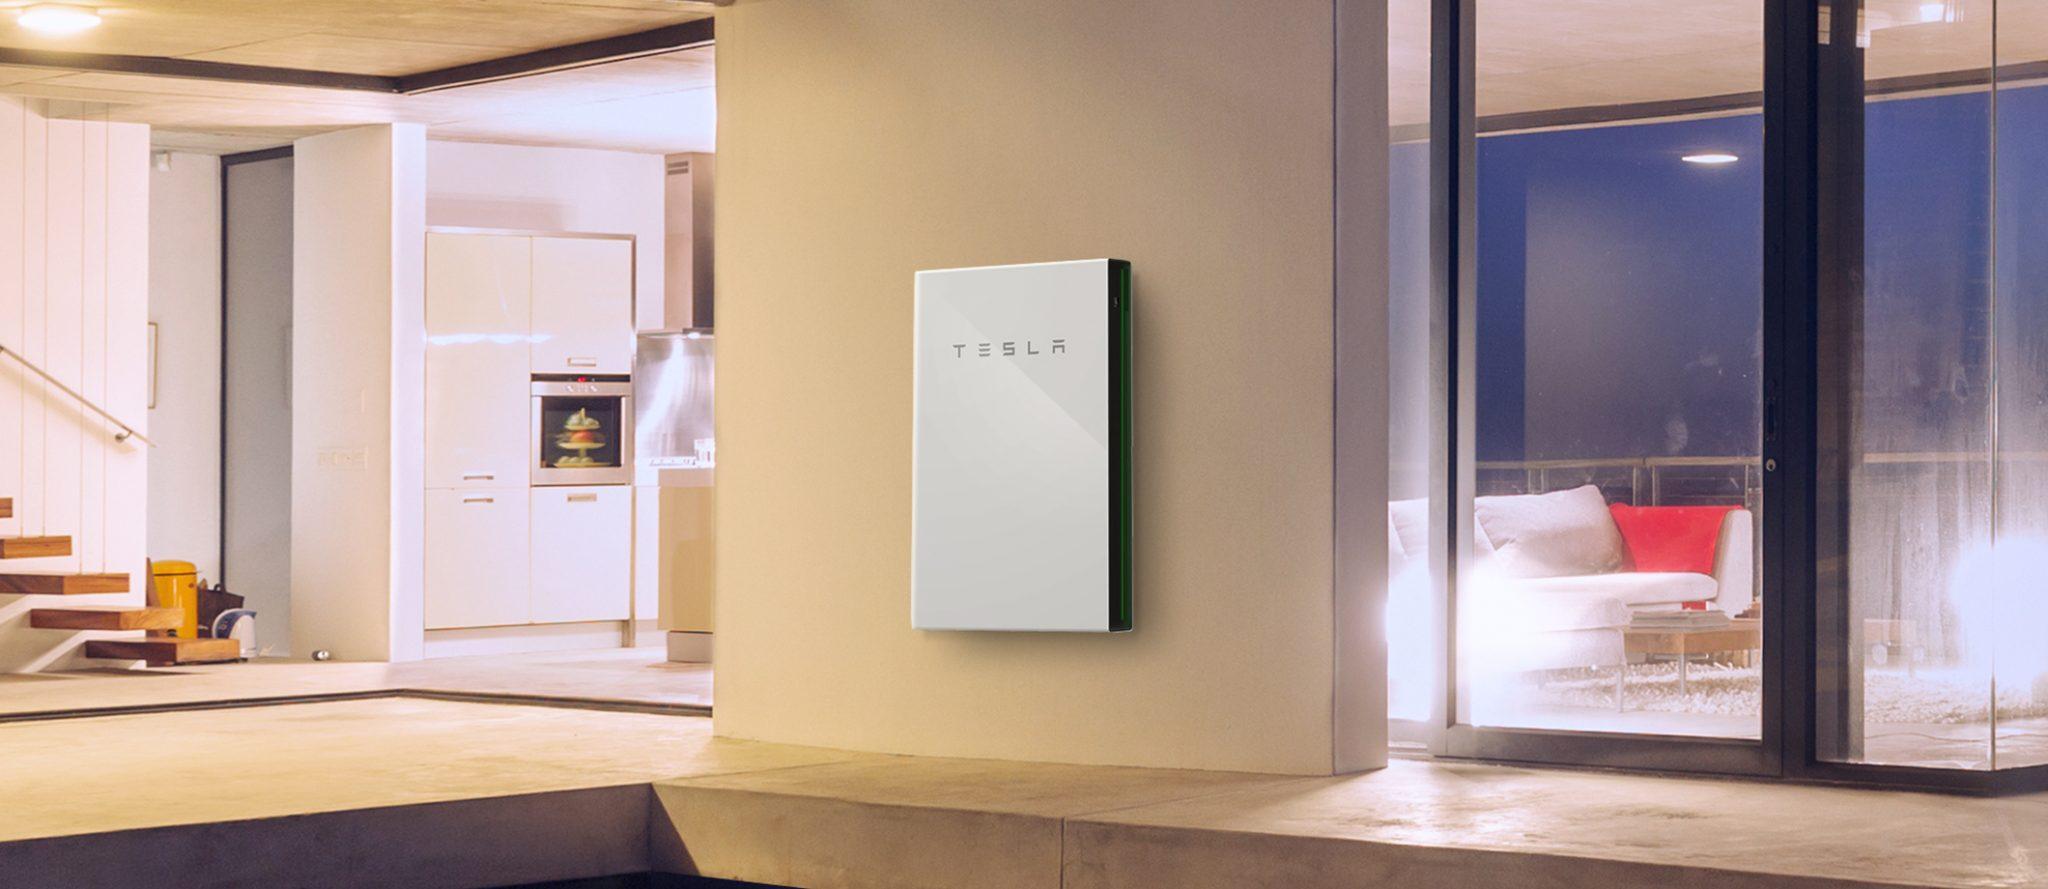 Energia solar fotovoltaica _ bateria solar residencial